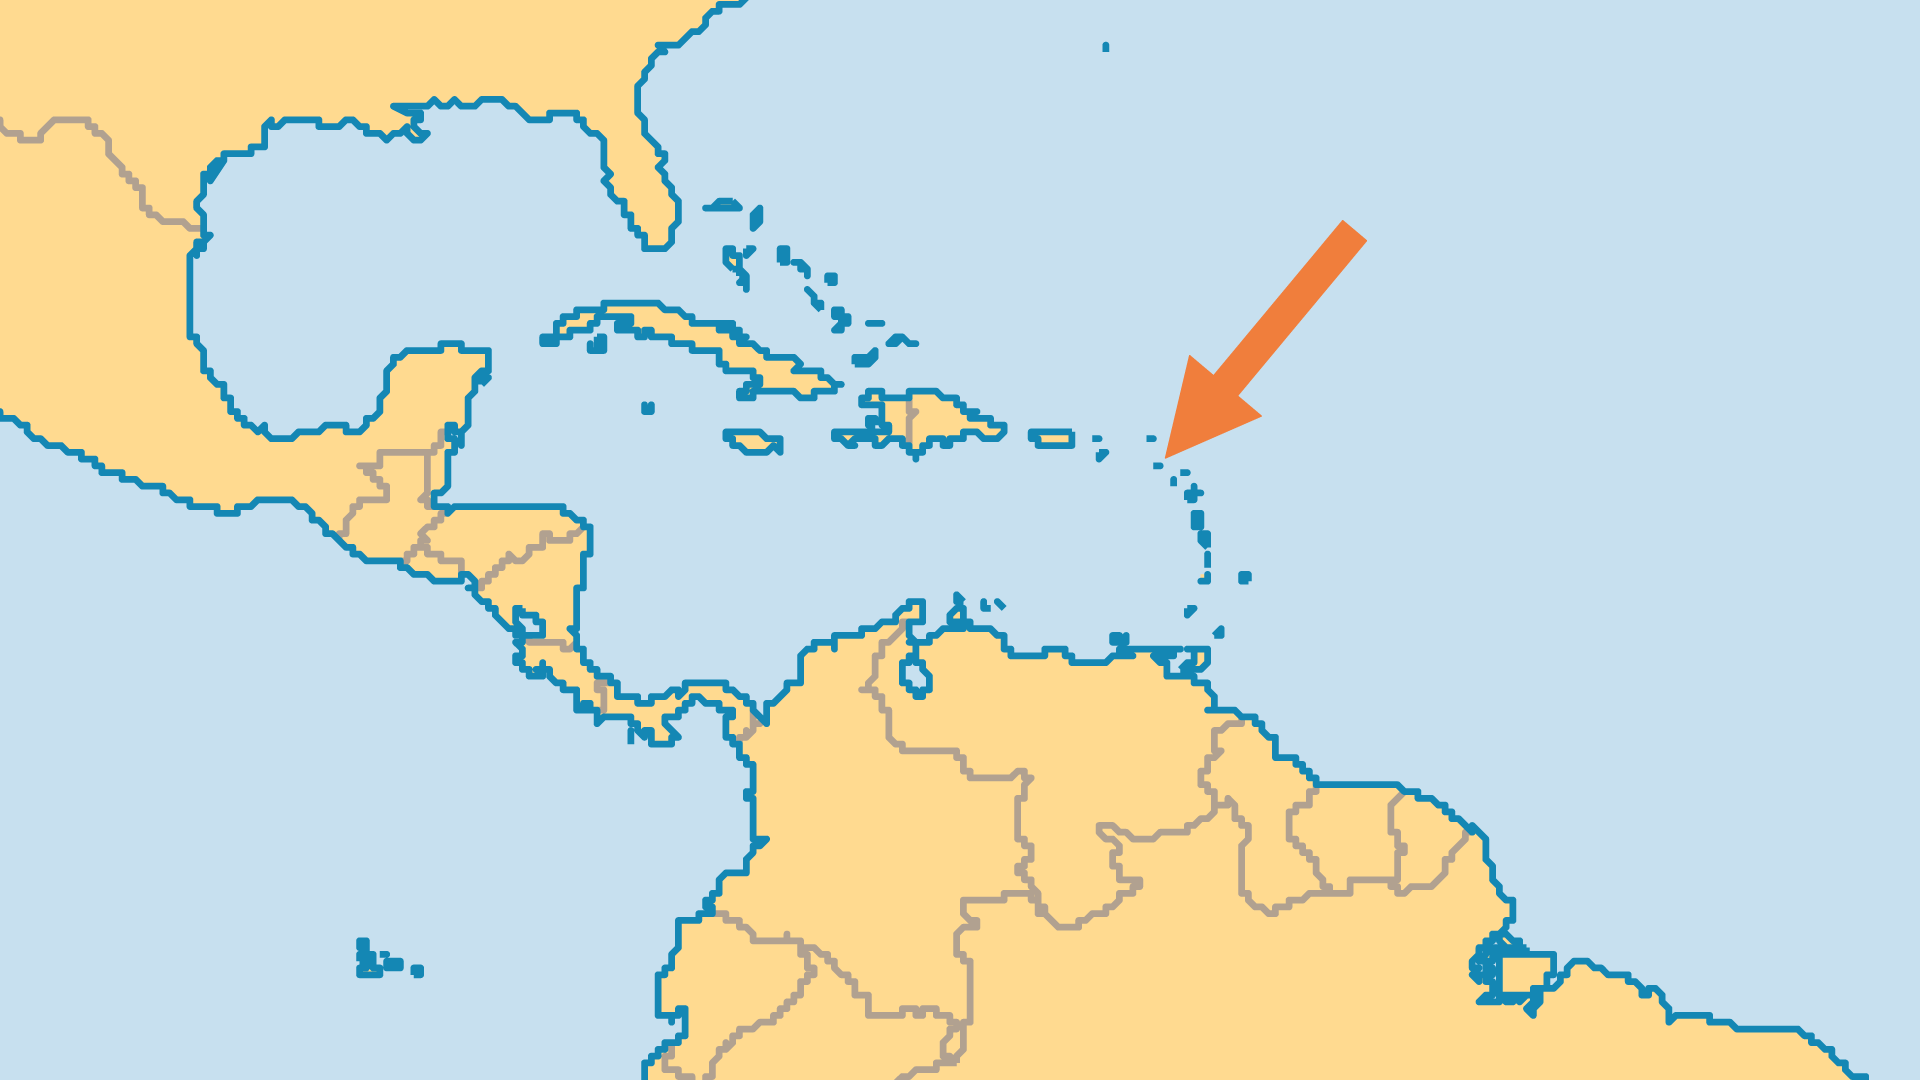 Locator Map for Saint Kitts & Nevis